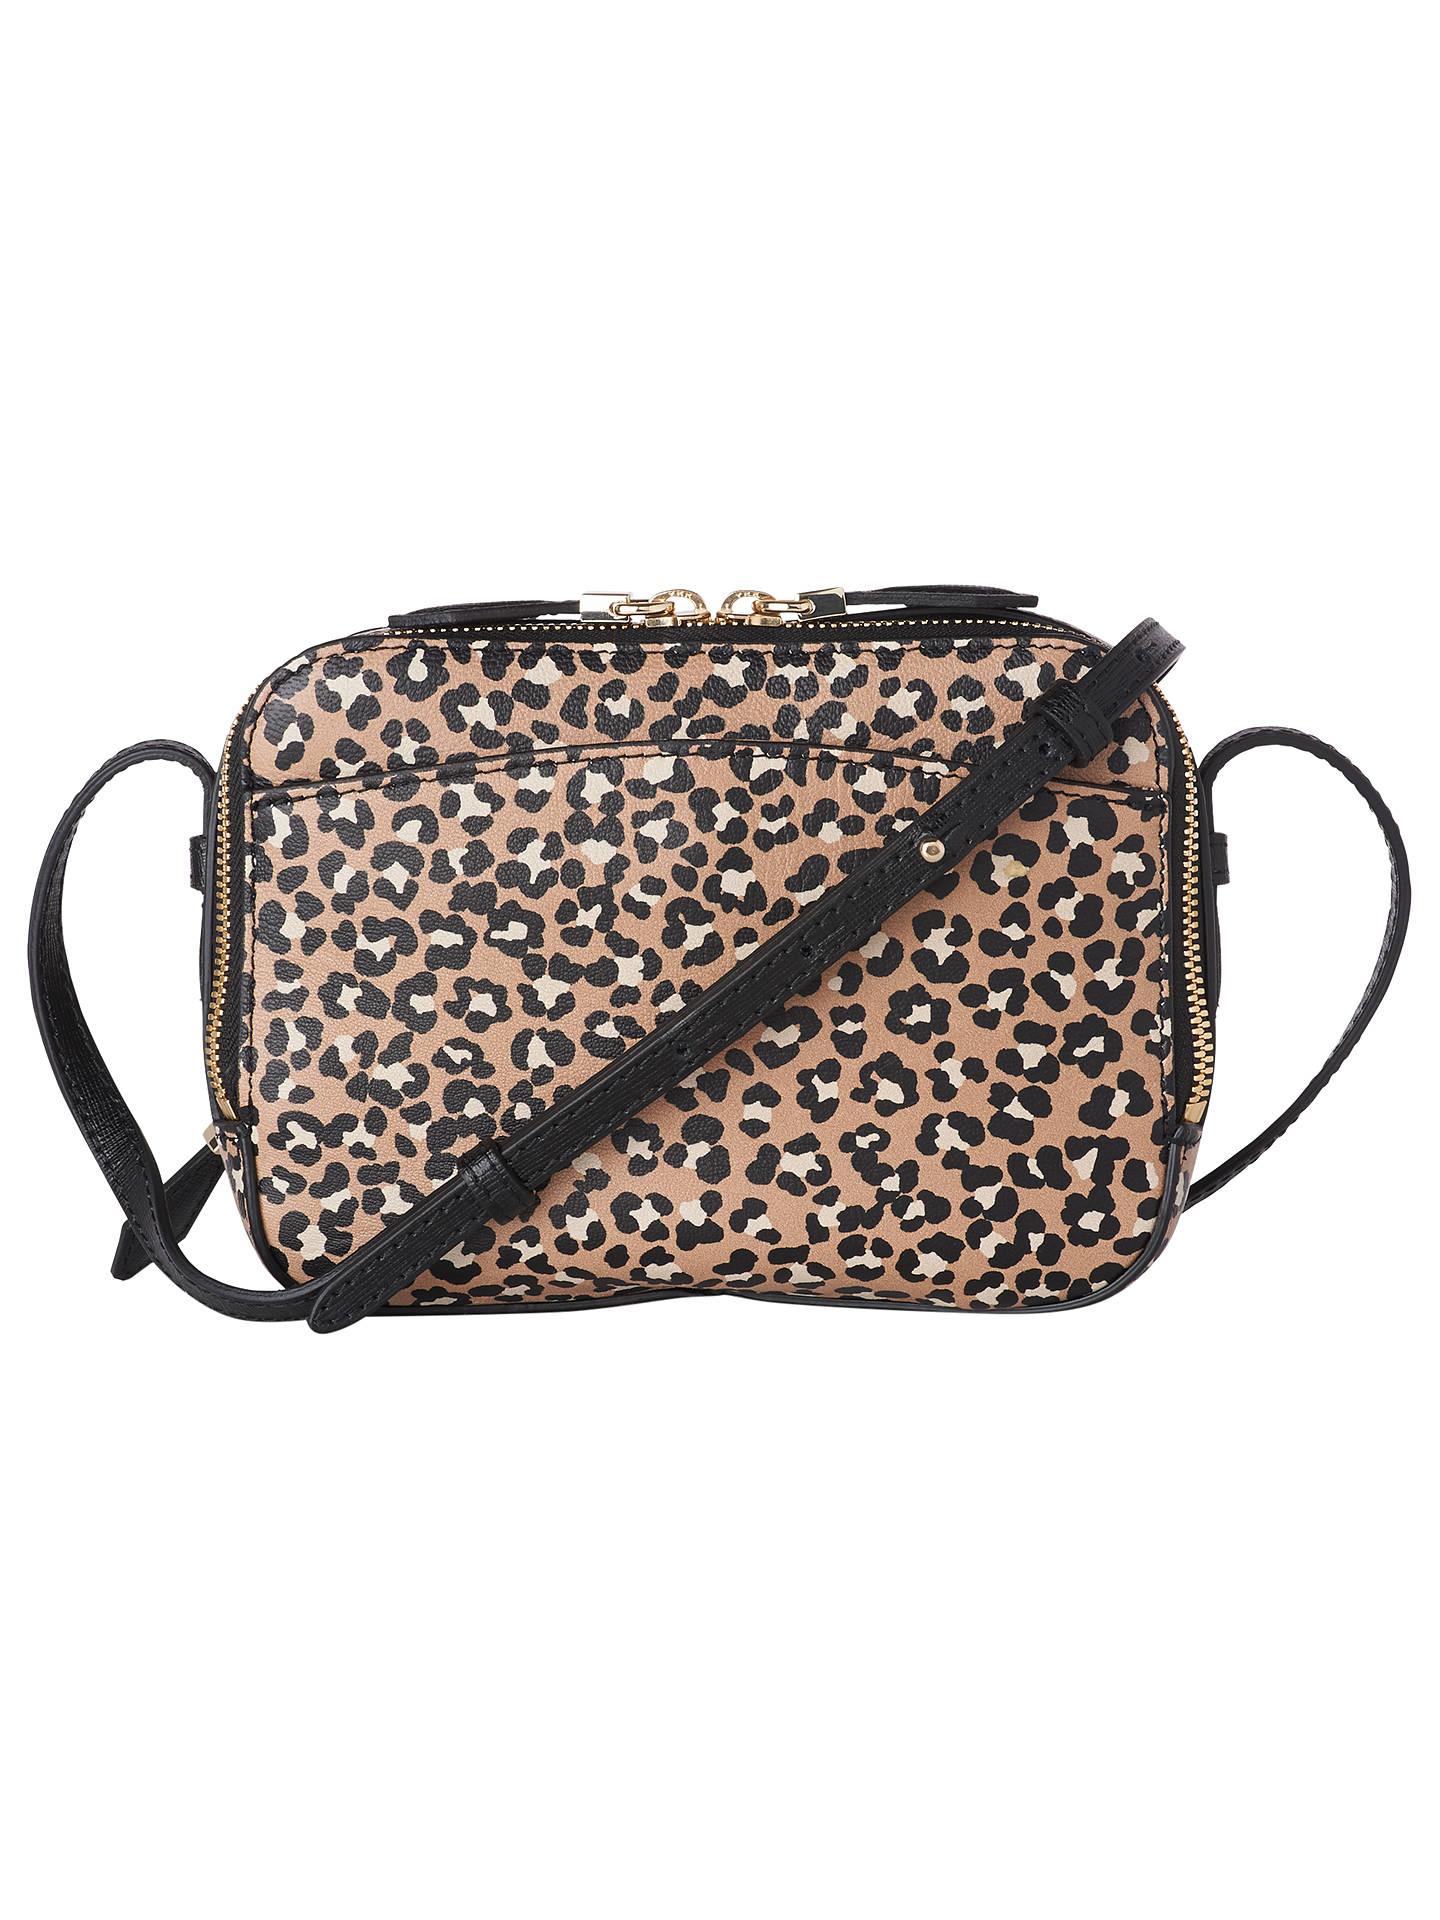 7cd83d9f9b6f Buy L.K.Bennett Mariel Leather Cross Body Bag, Animal Print Online at  johnlewis.com ...